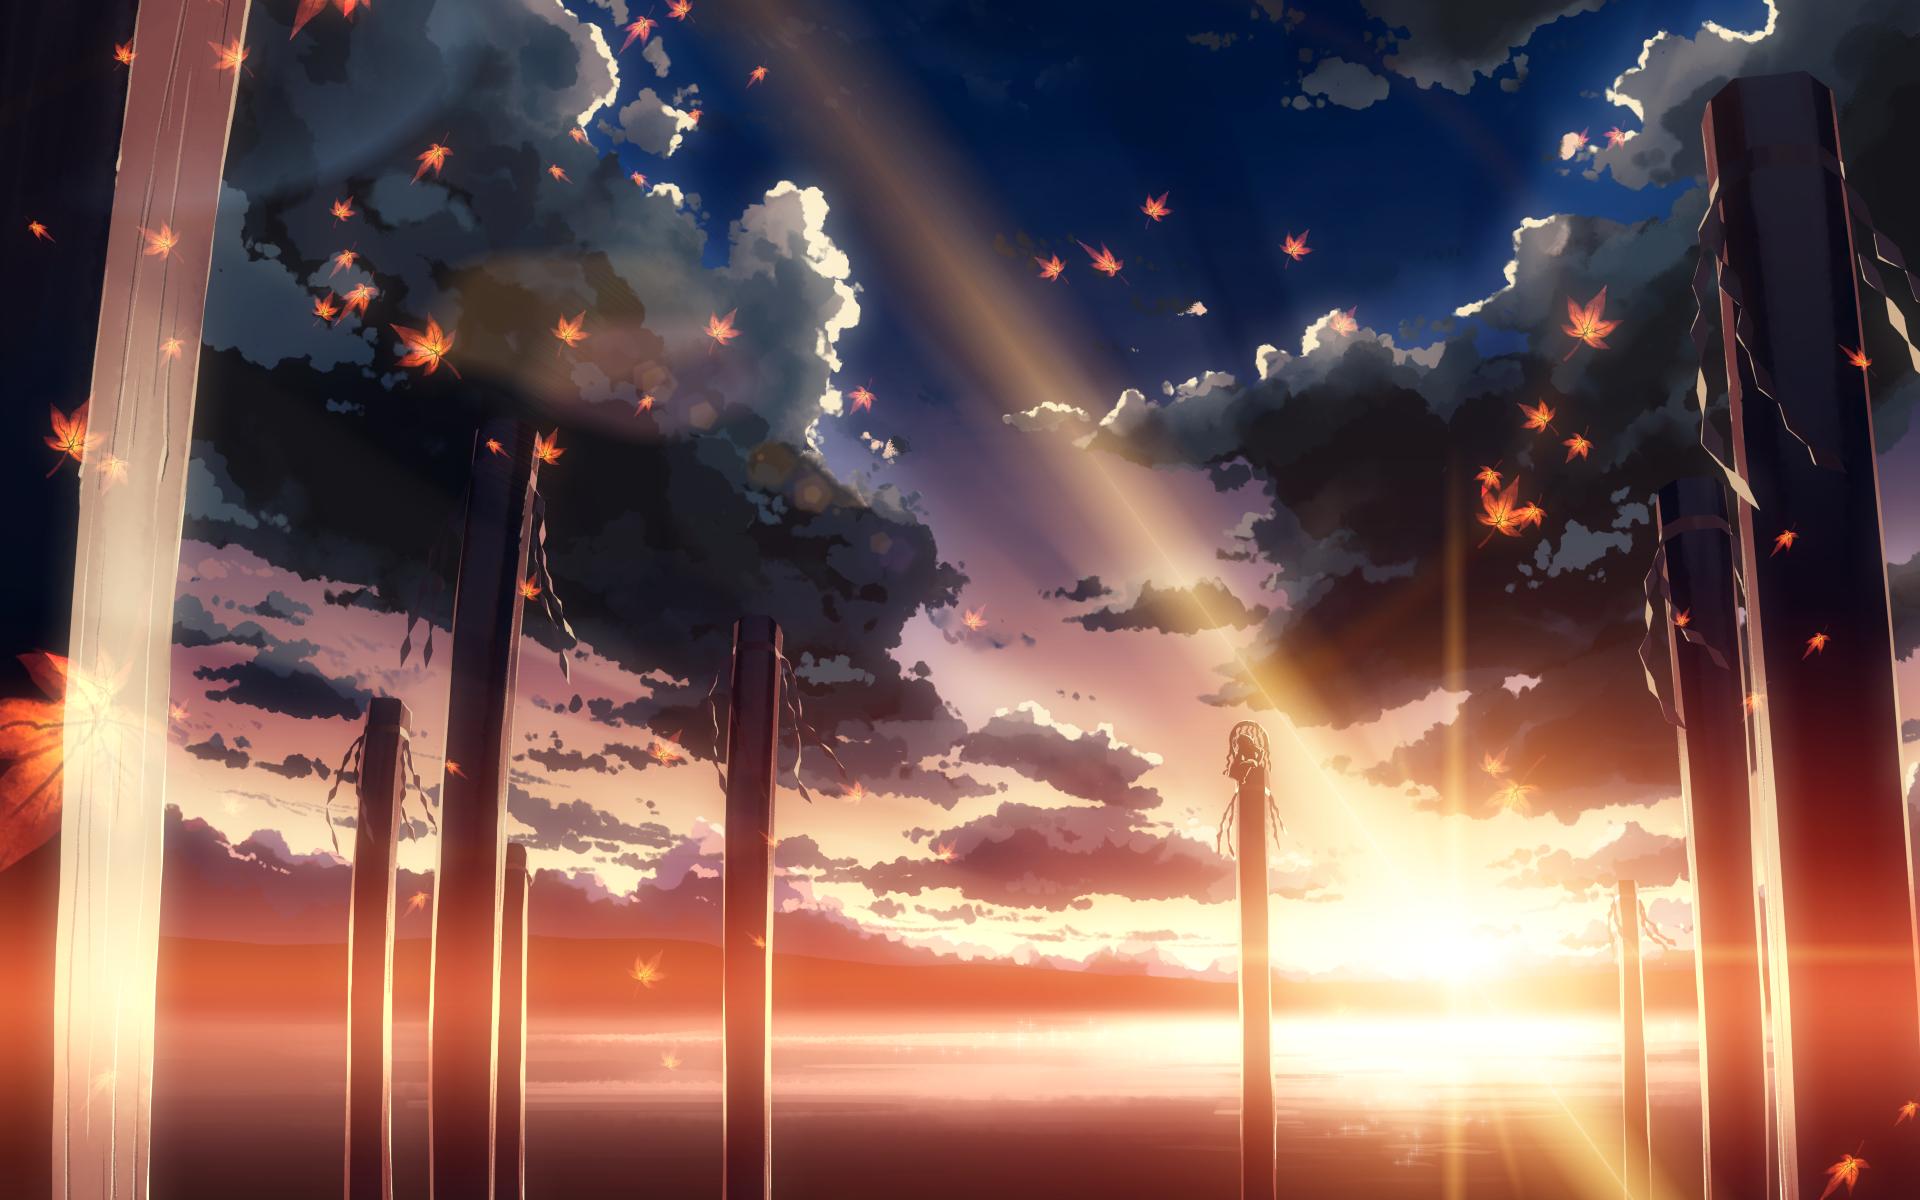 Anime - Touhou  Anime Kanako Yasaka Wallpaper